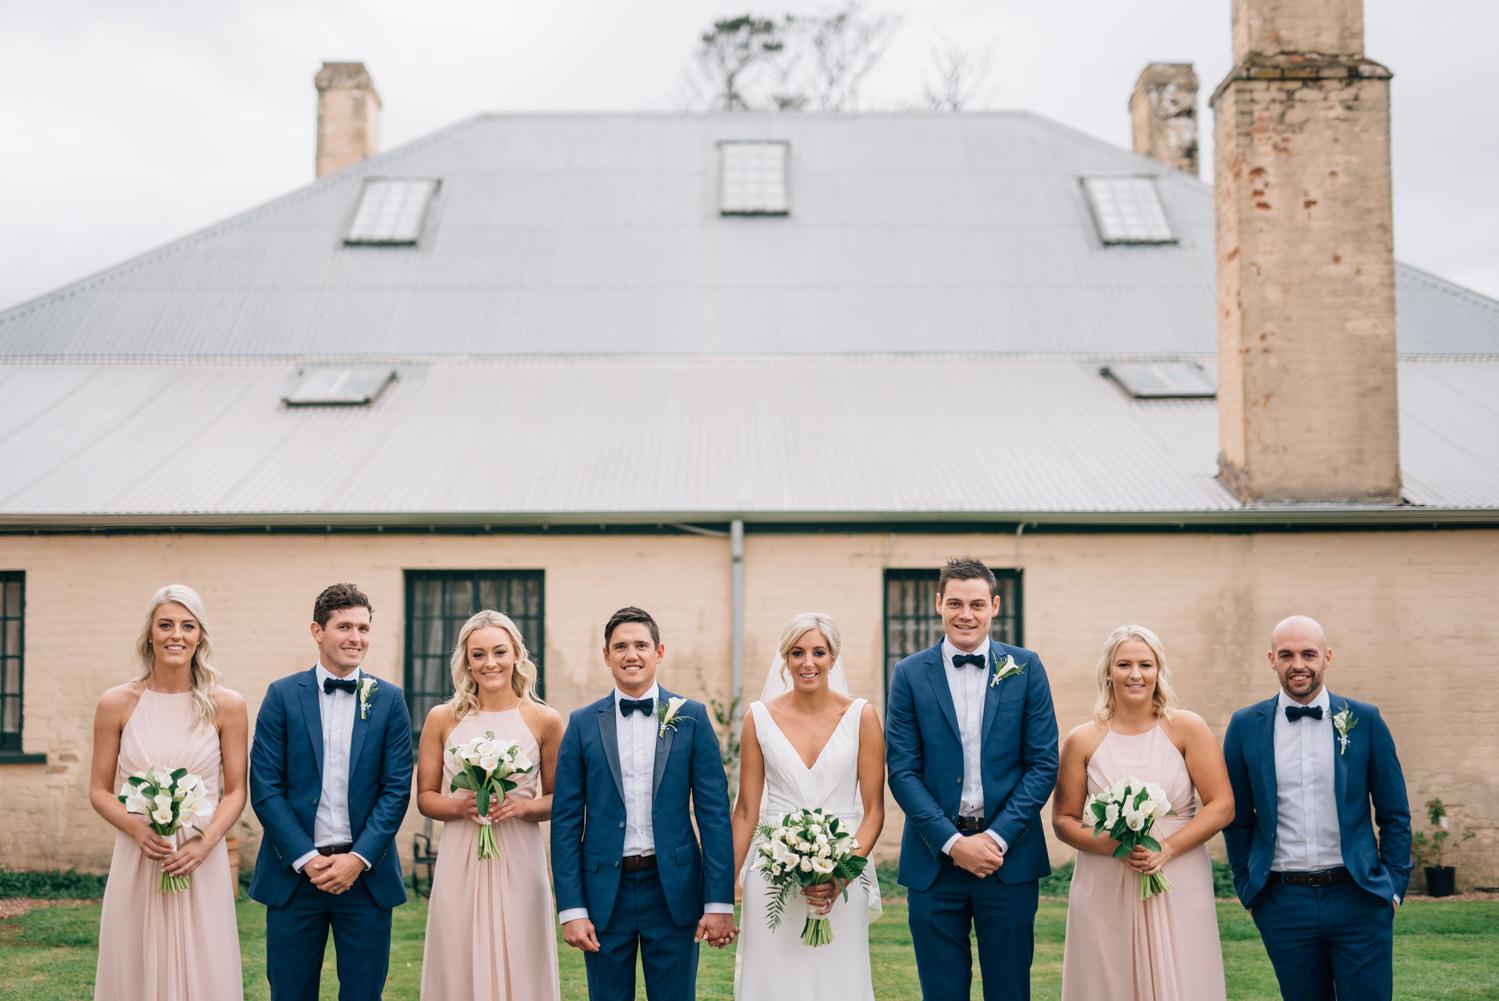 Entally-House-Wedding-Photographer-63.jpg